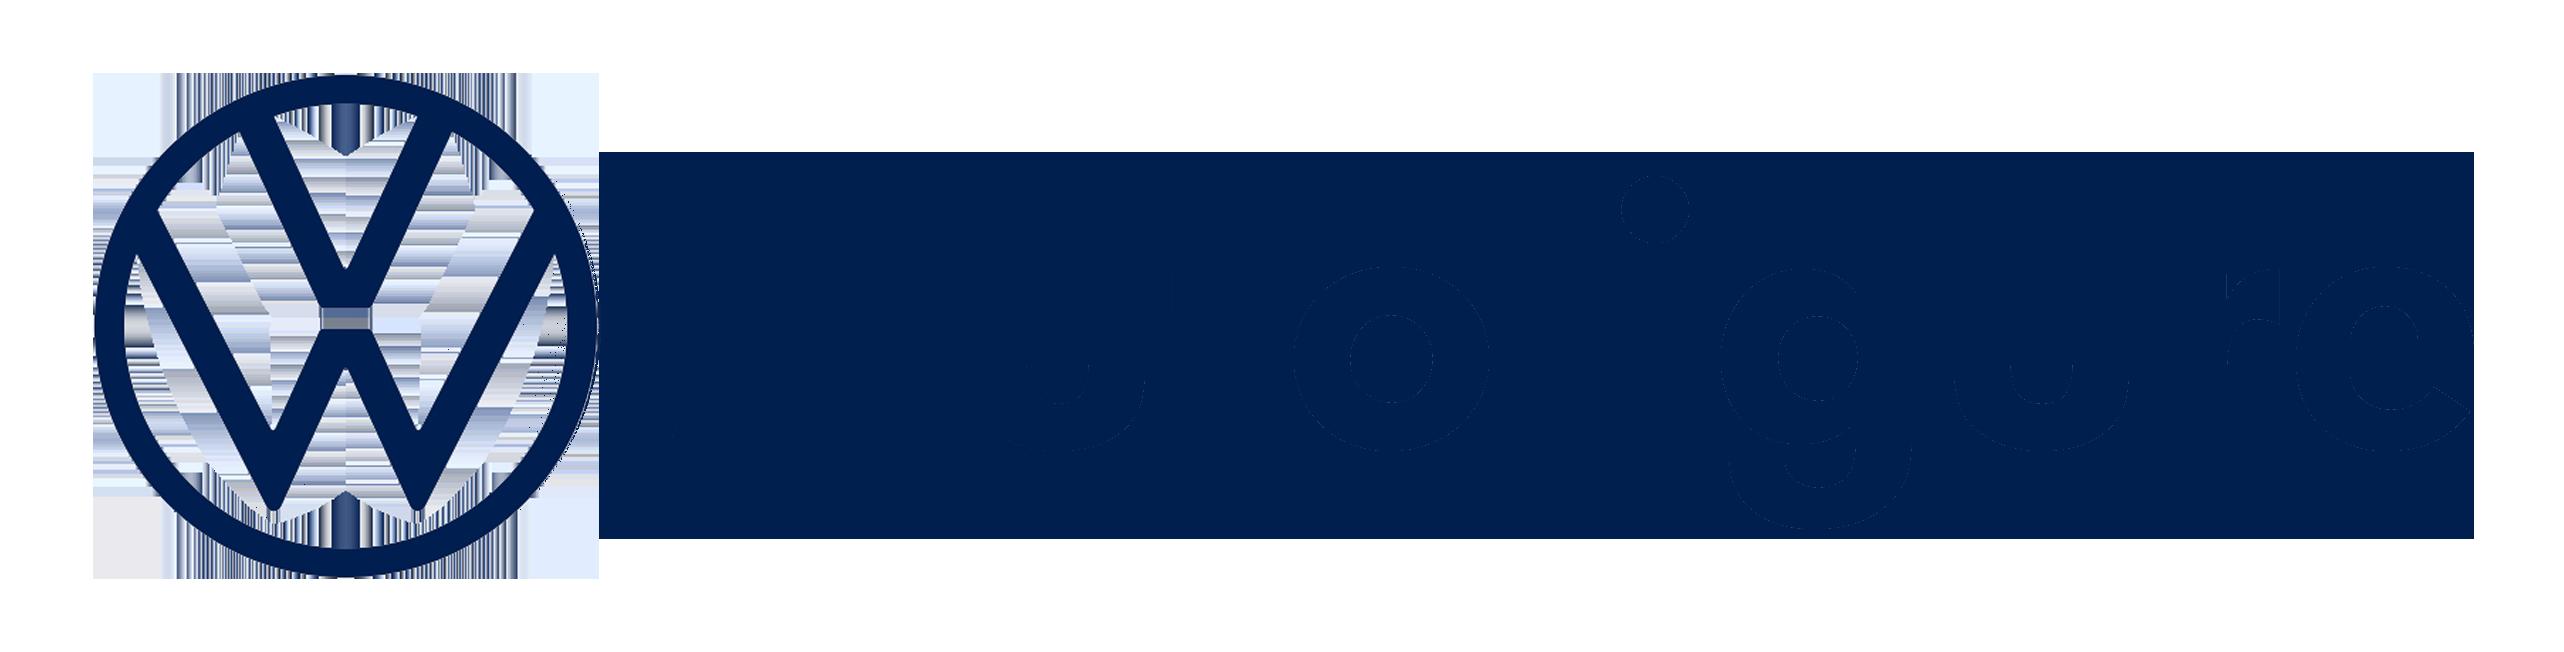 Autoligure logo